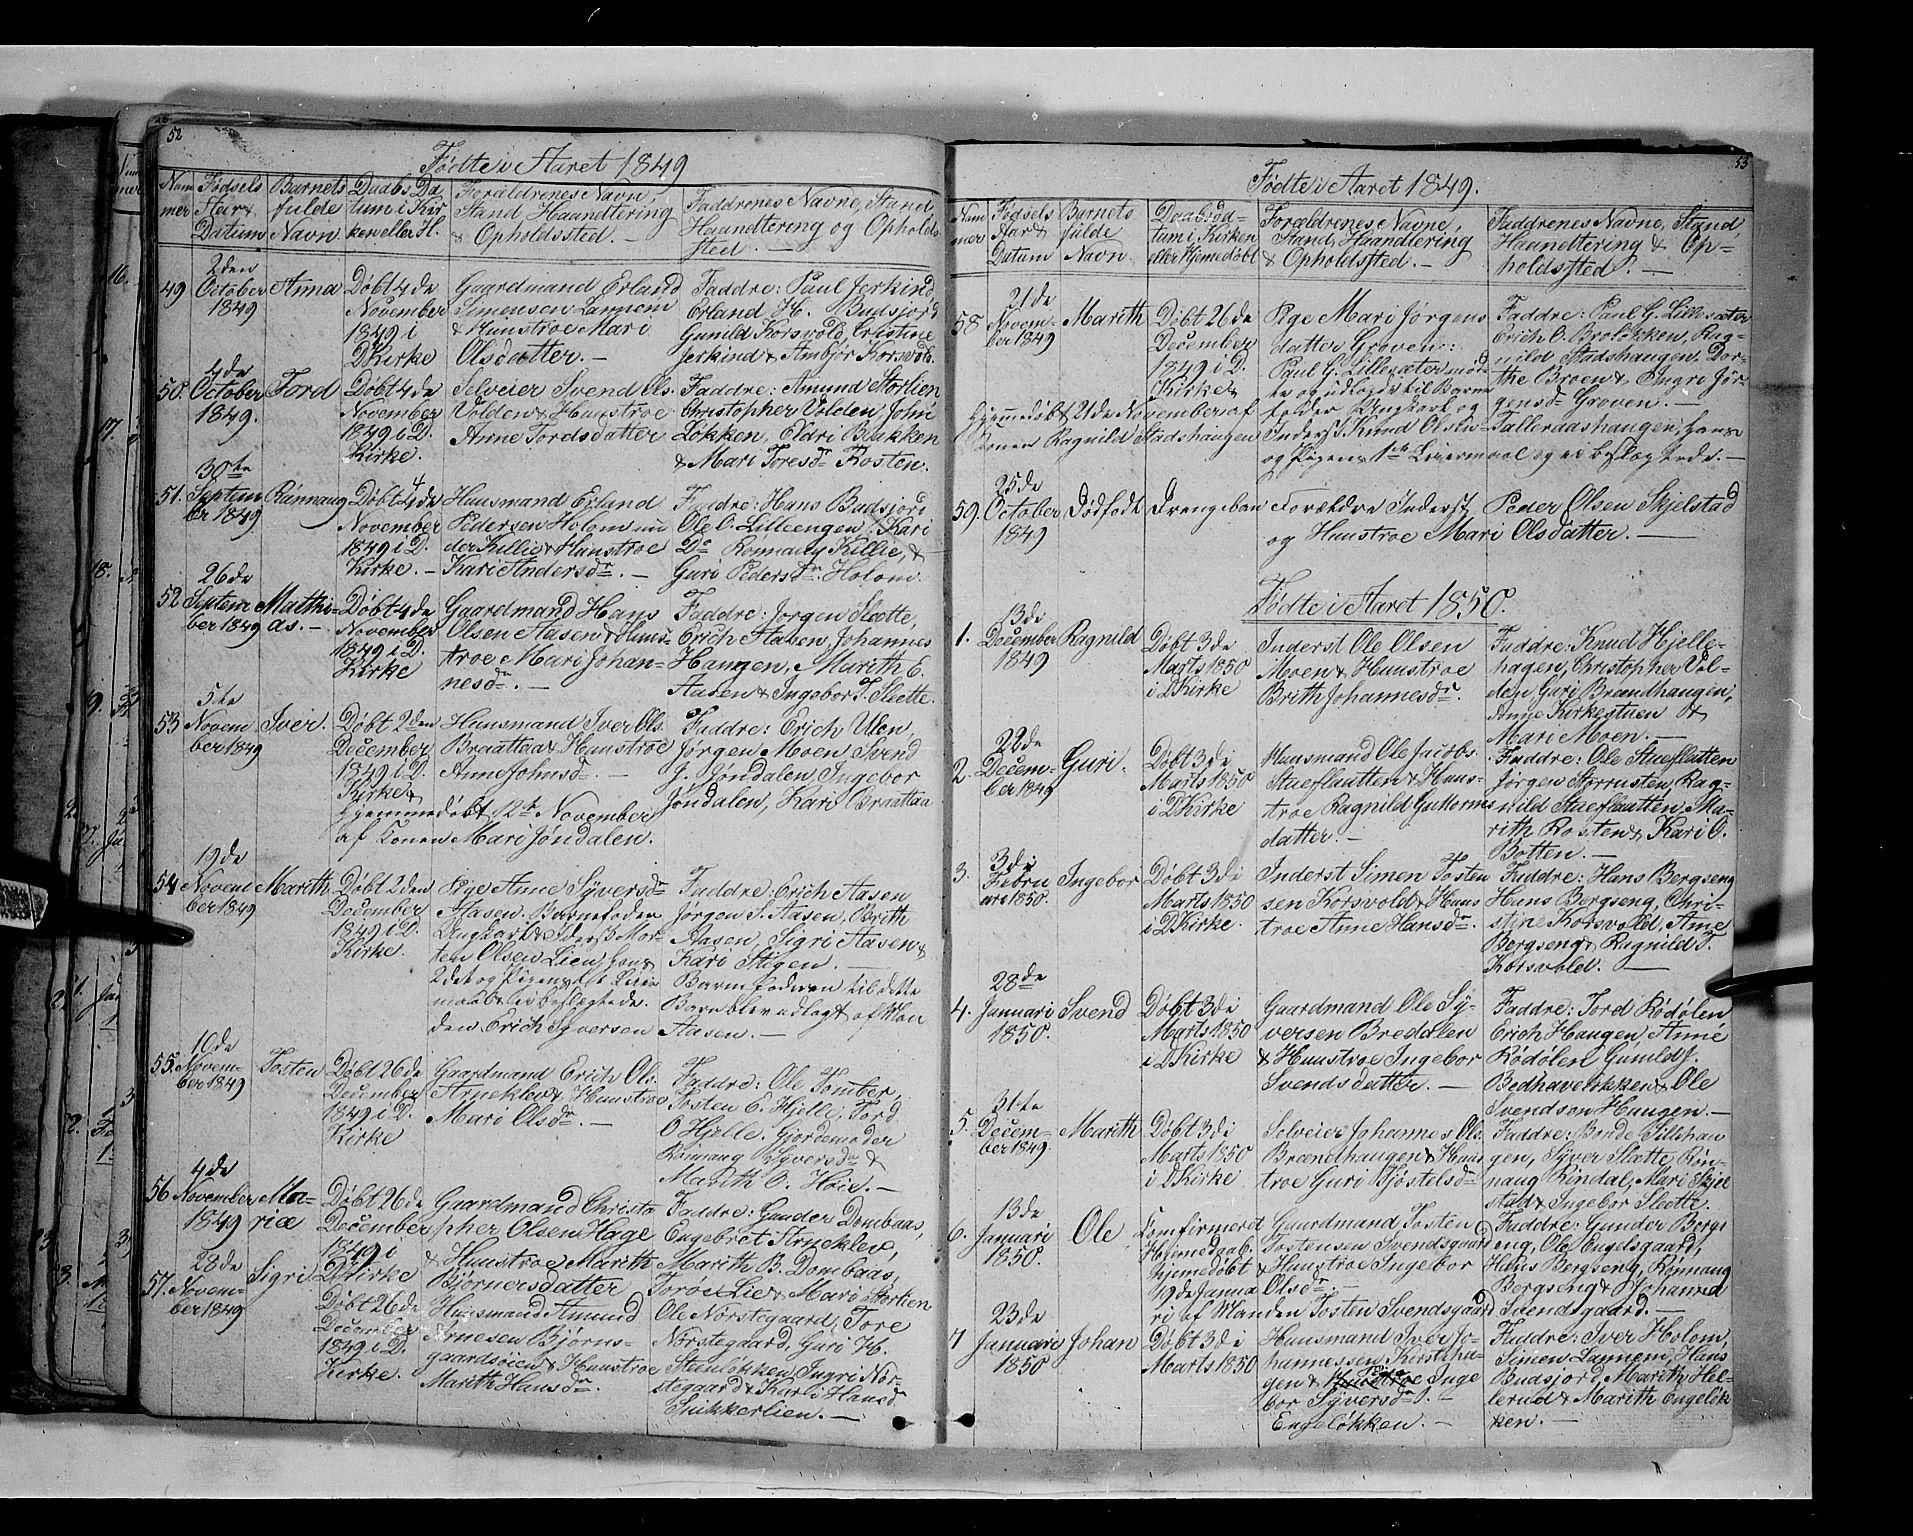 SAH, Lesja prestekontor, Klokkerbok nr. 3, 1842-1862, s. 52-53